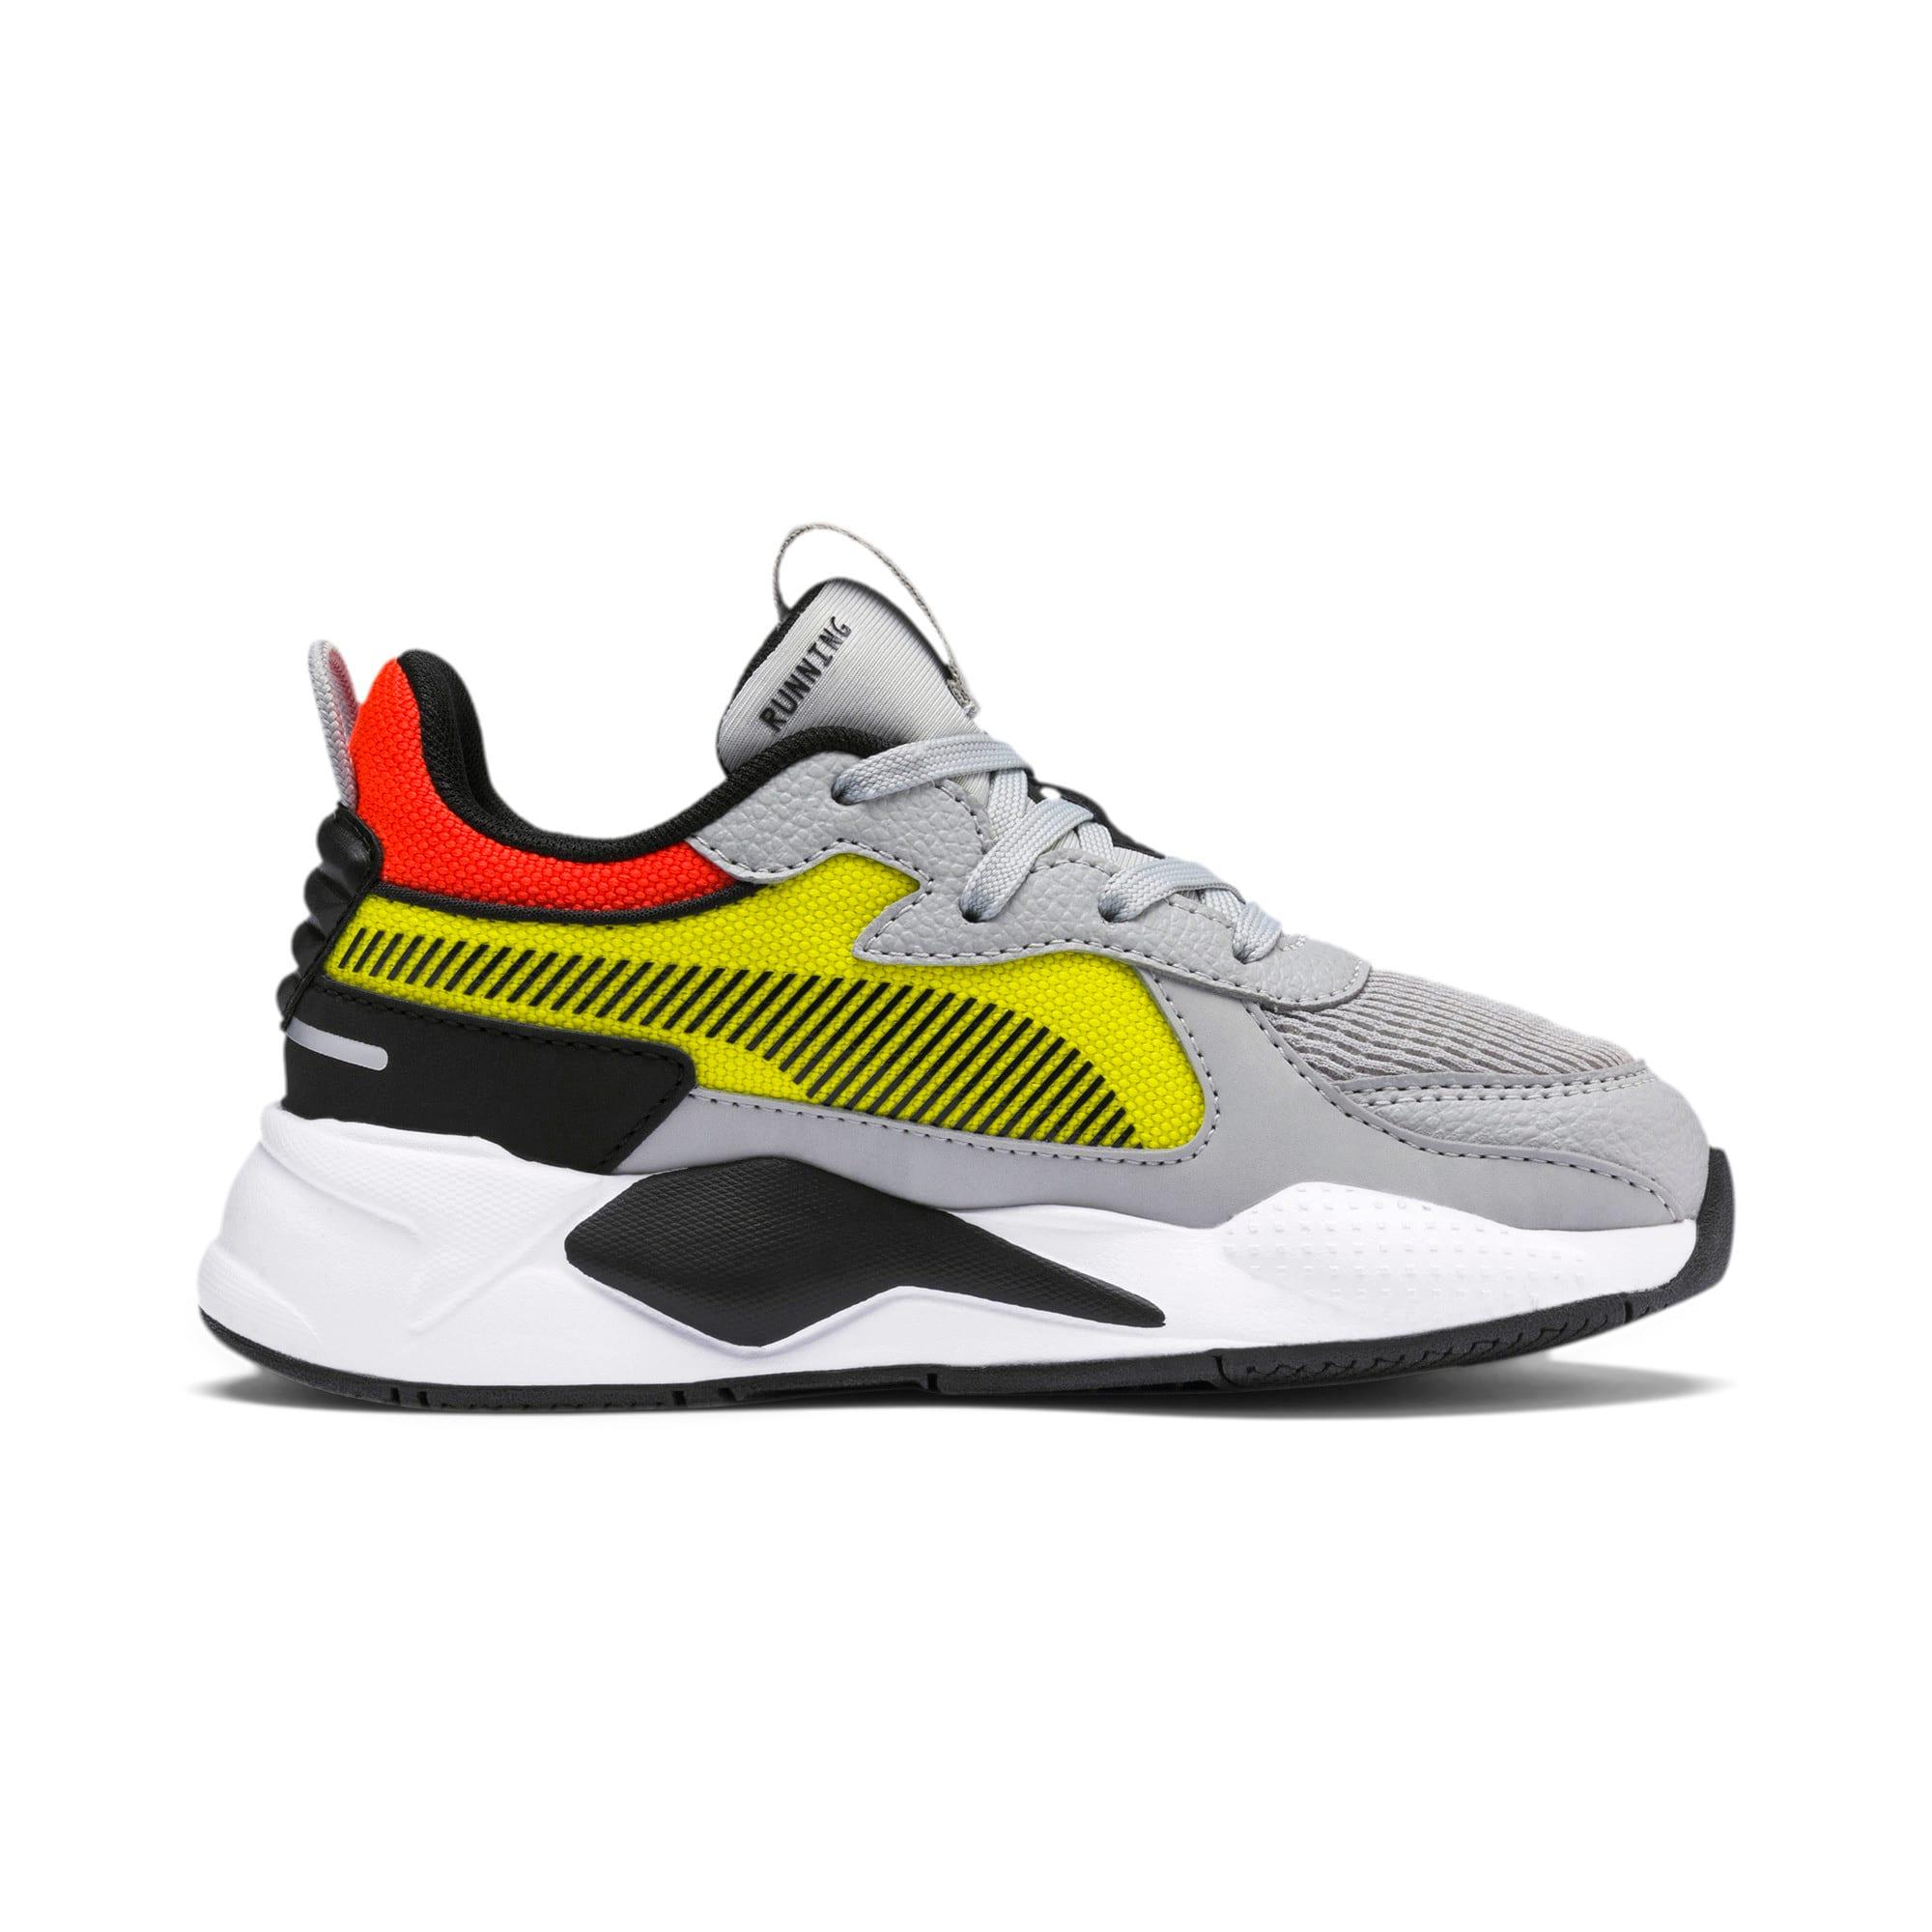 Thumbnail 5 of RS-X Hard Drive Little Kids' Shoes, High Rise-Yellow Alert, medium